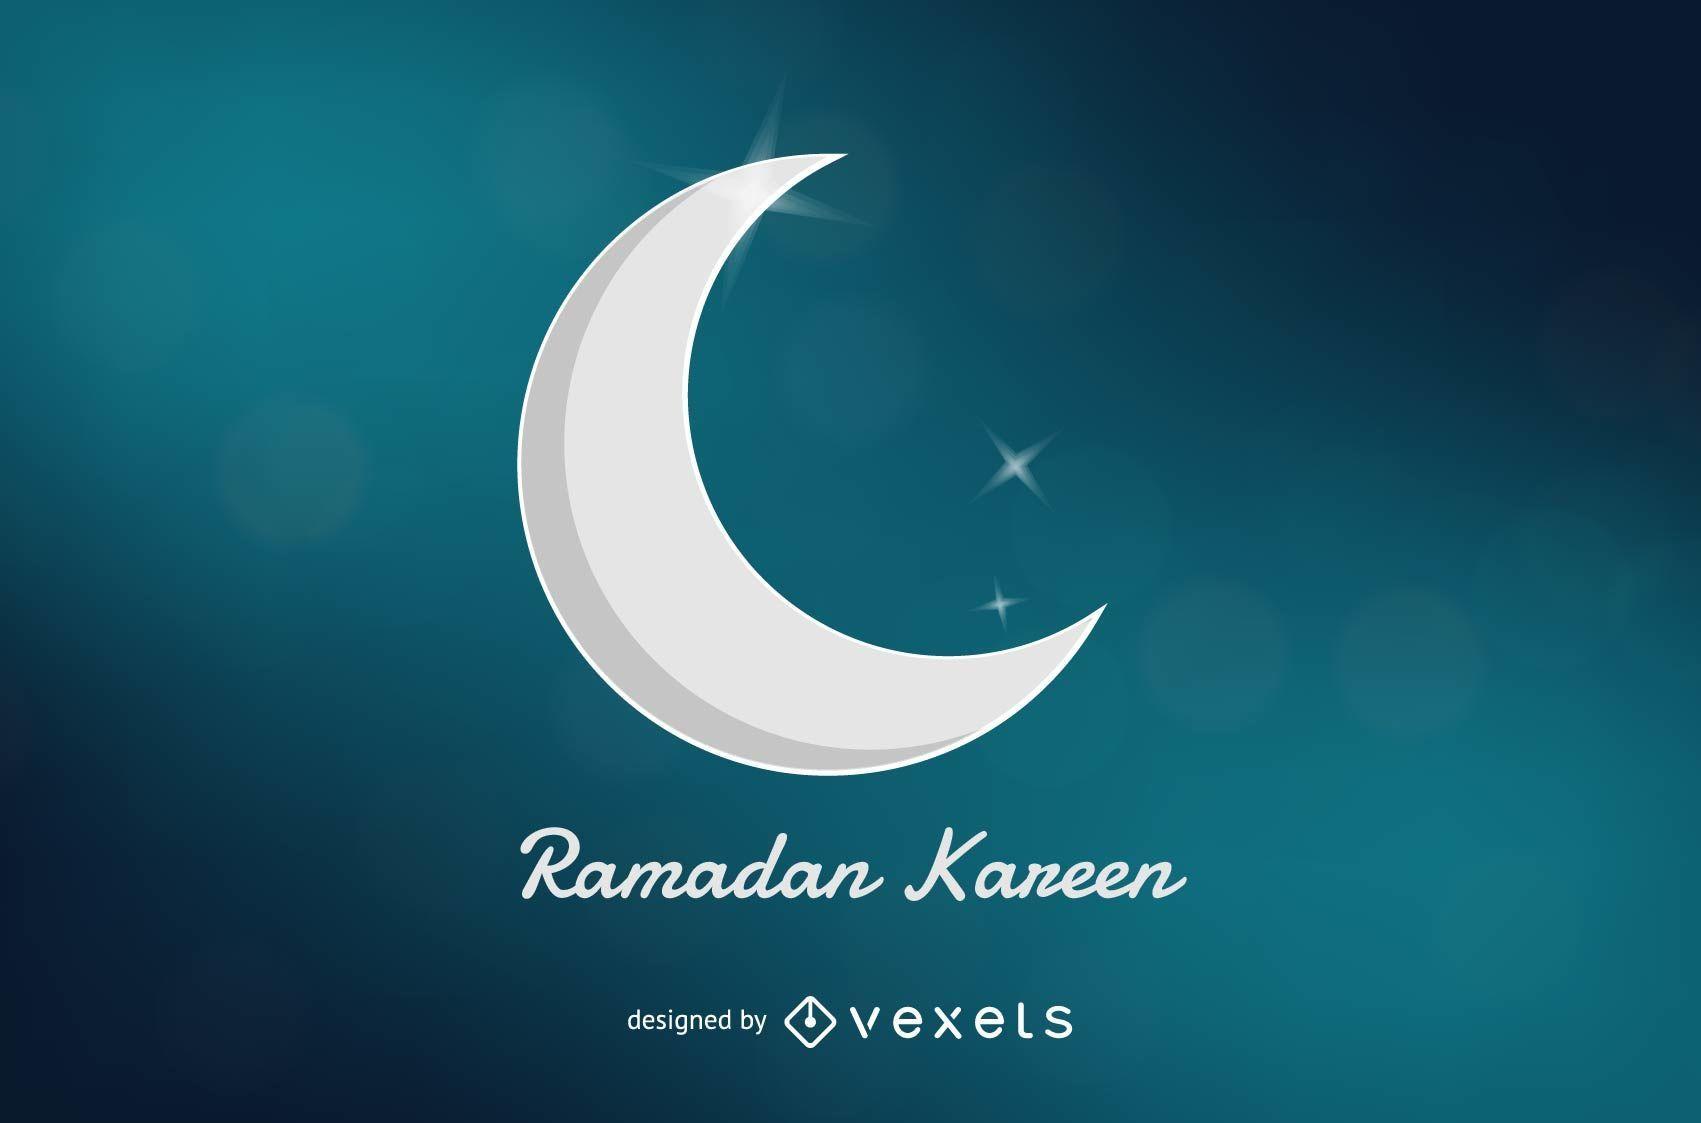 Ramadan Kareem Shiny Crescent Moon Background